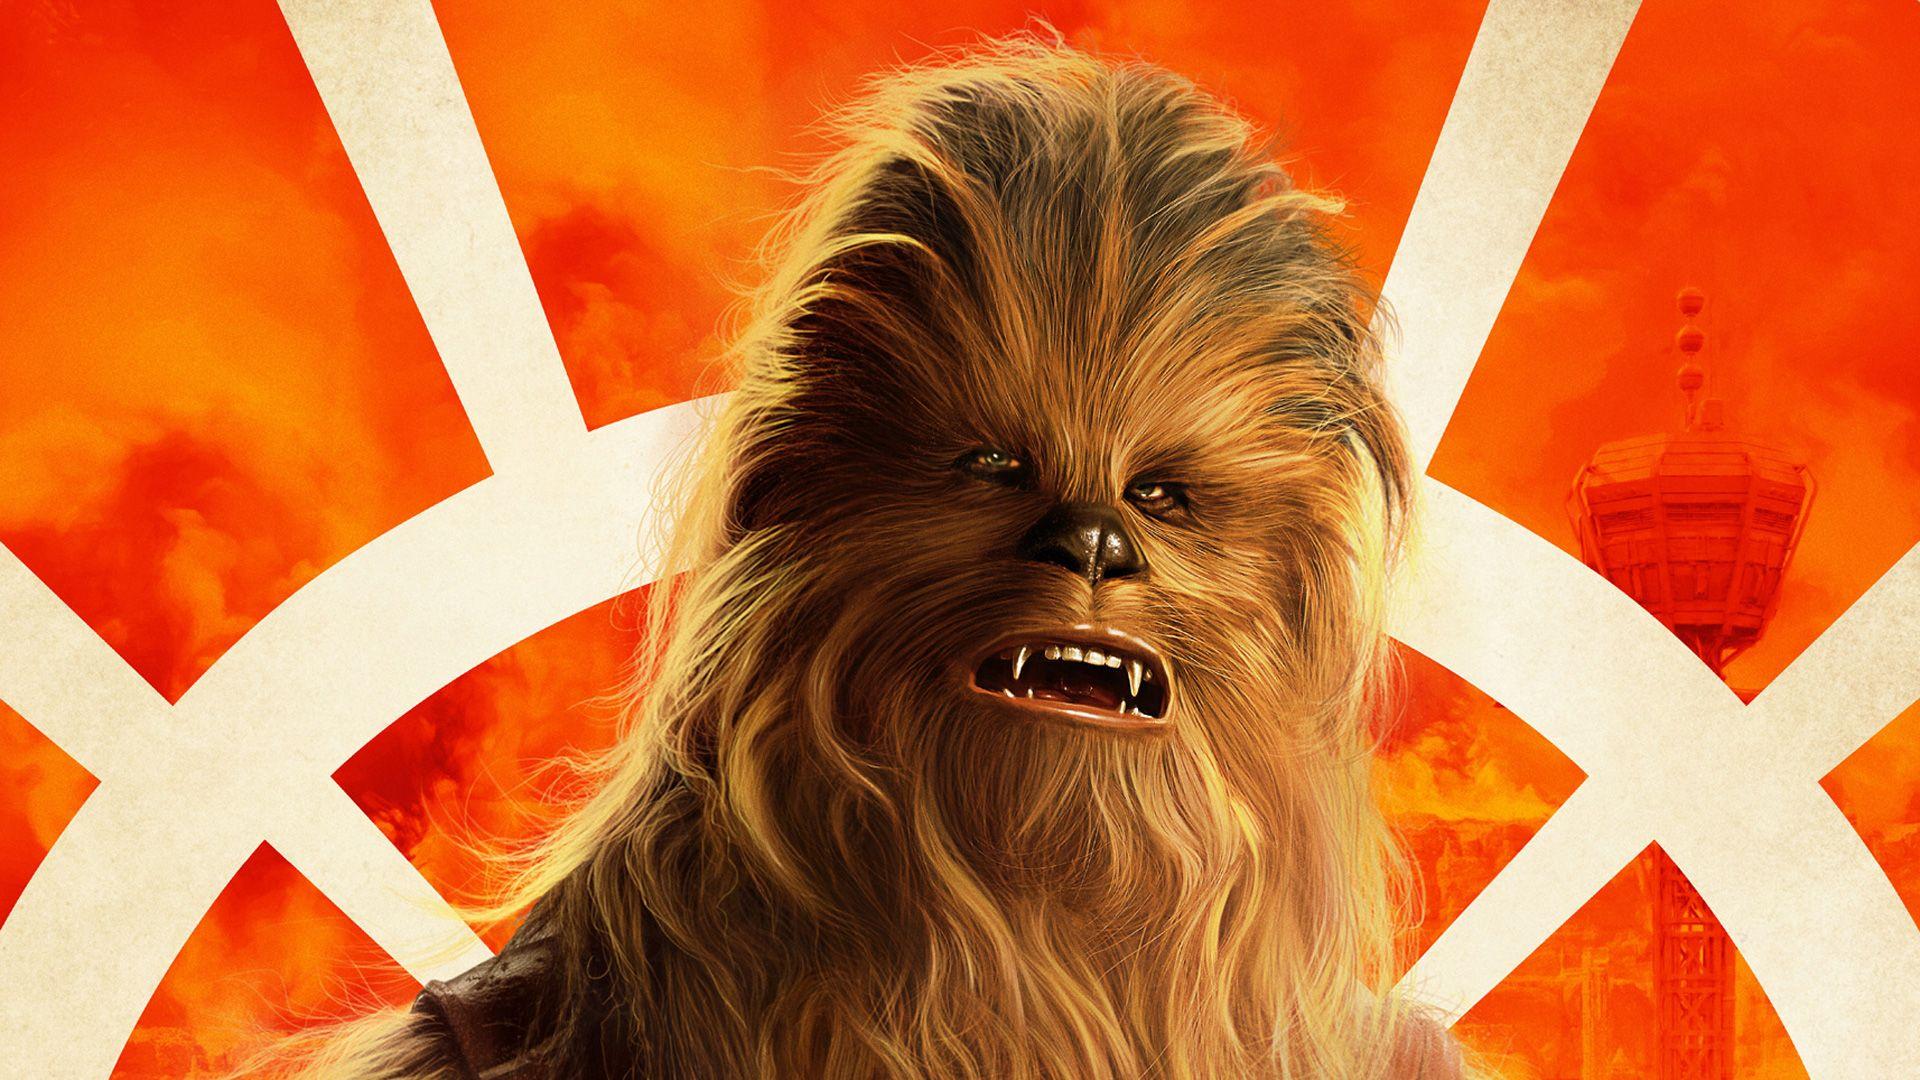 Chewbacca wallpaper free